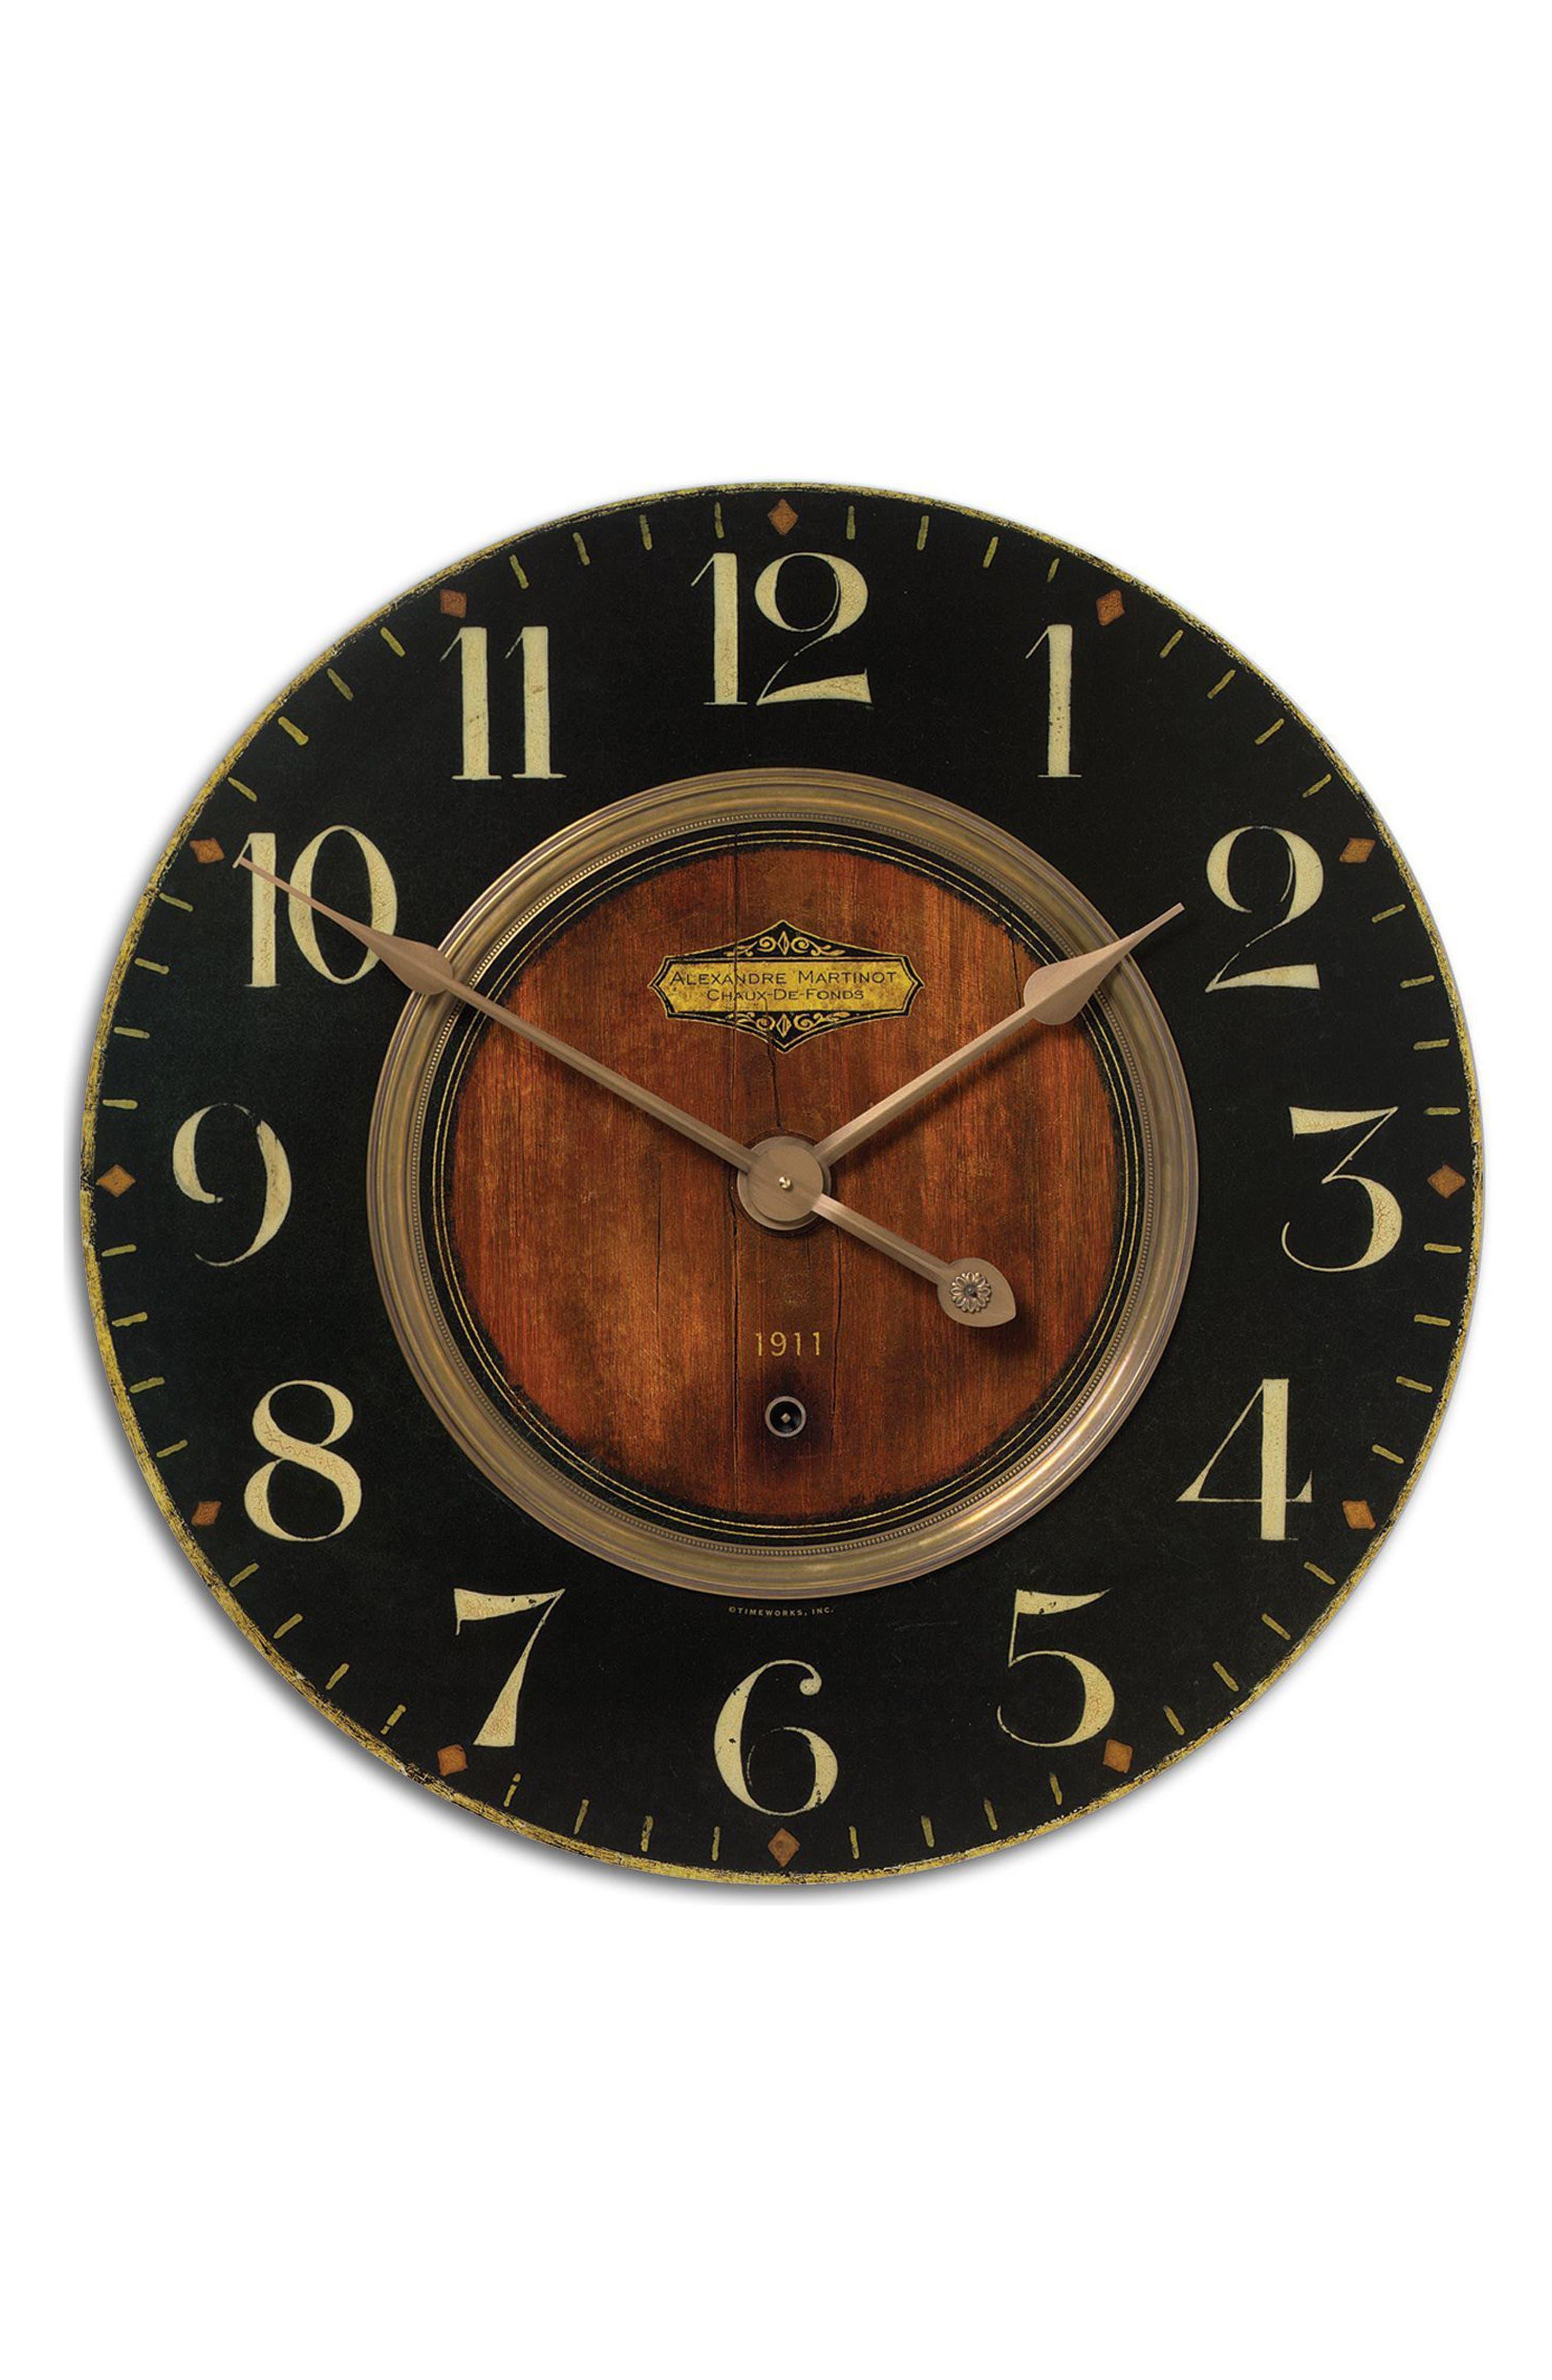 Main Image - Uttermost Alexandre Martinot Wall Clock